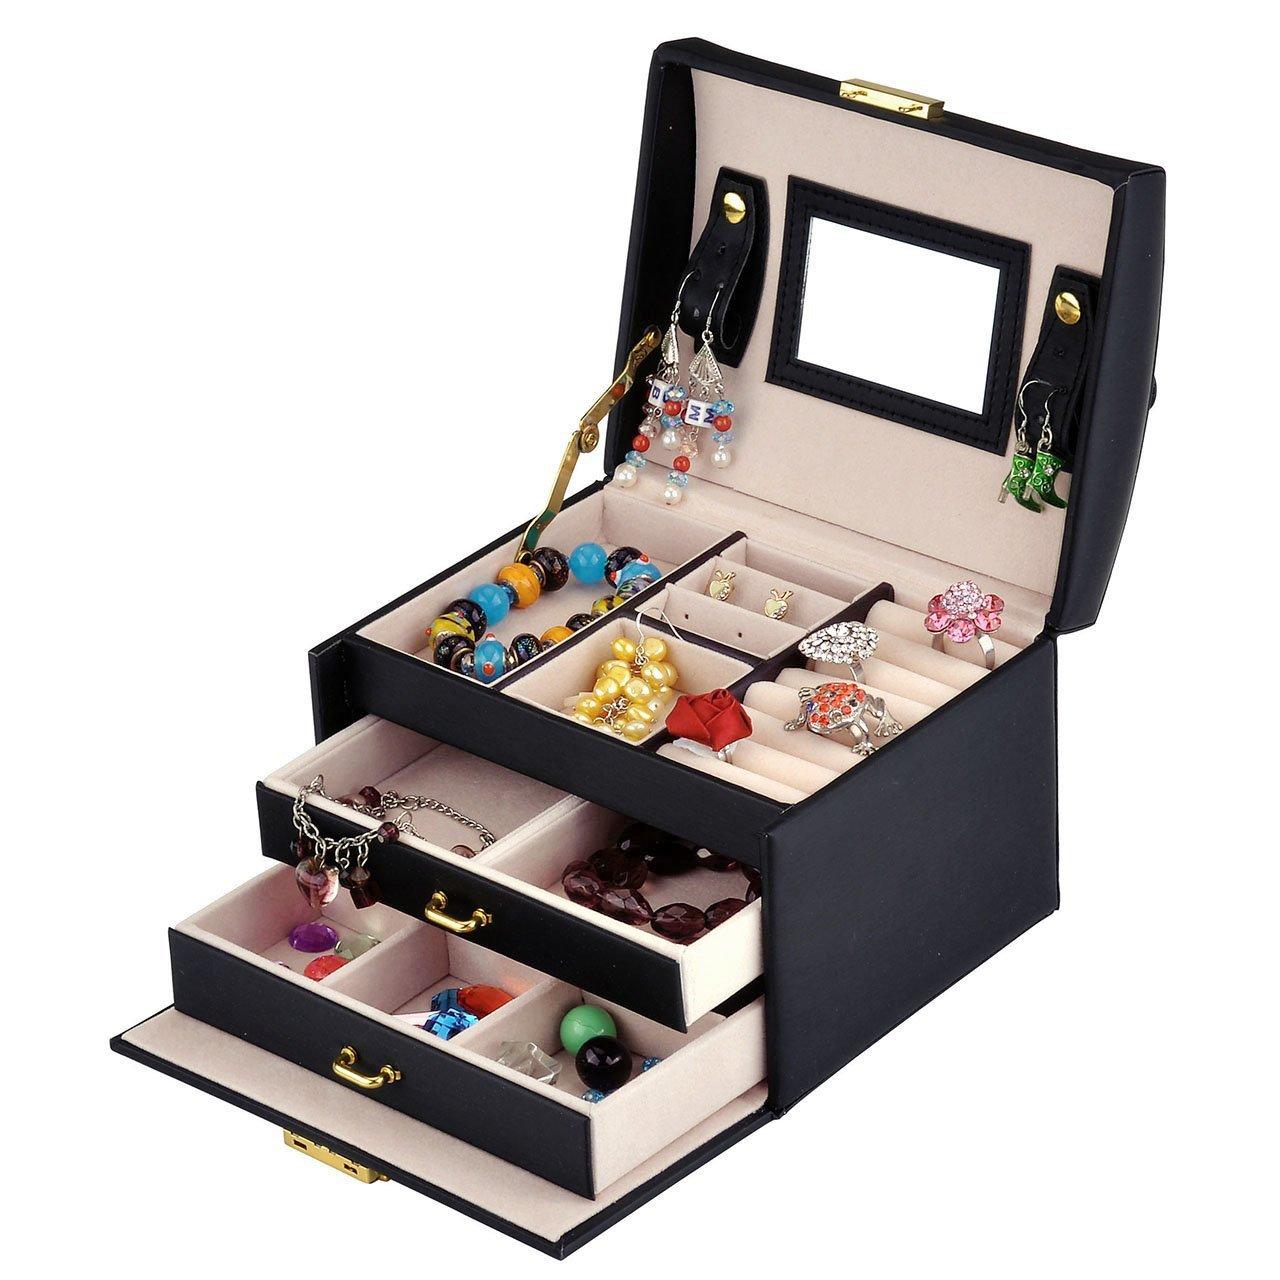 Wuligirl 3-Layer Mirrored Jewelry Box Lockable Travel Jewelry Storage Organizer Display Jewelry Earrings Rings Bracelets Case Black(3-Layer Jewelry Box)